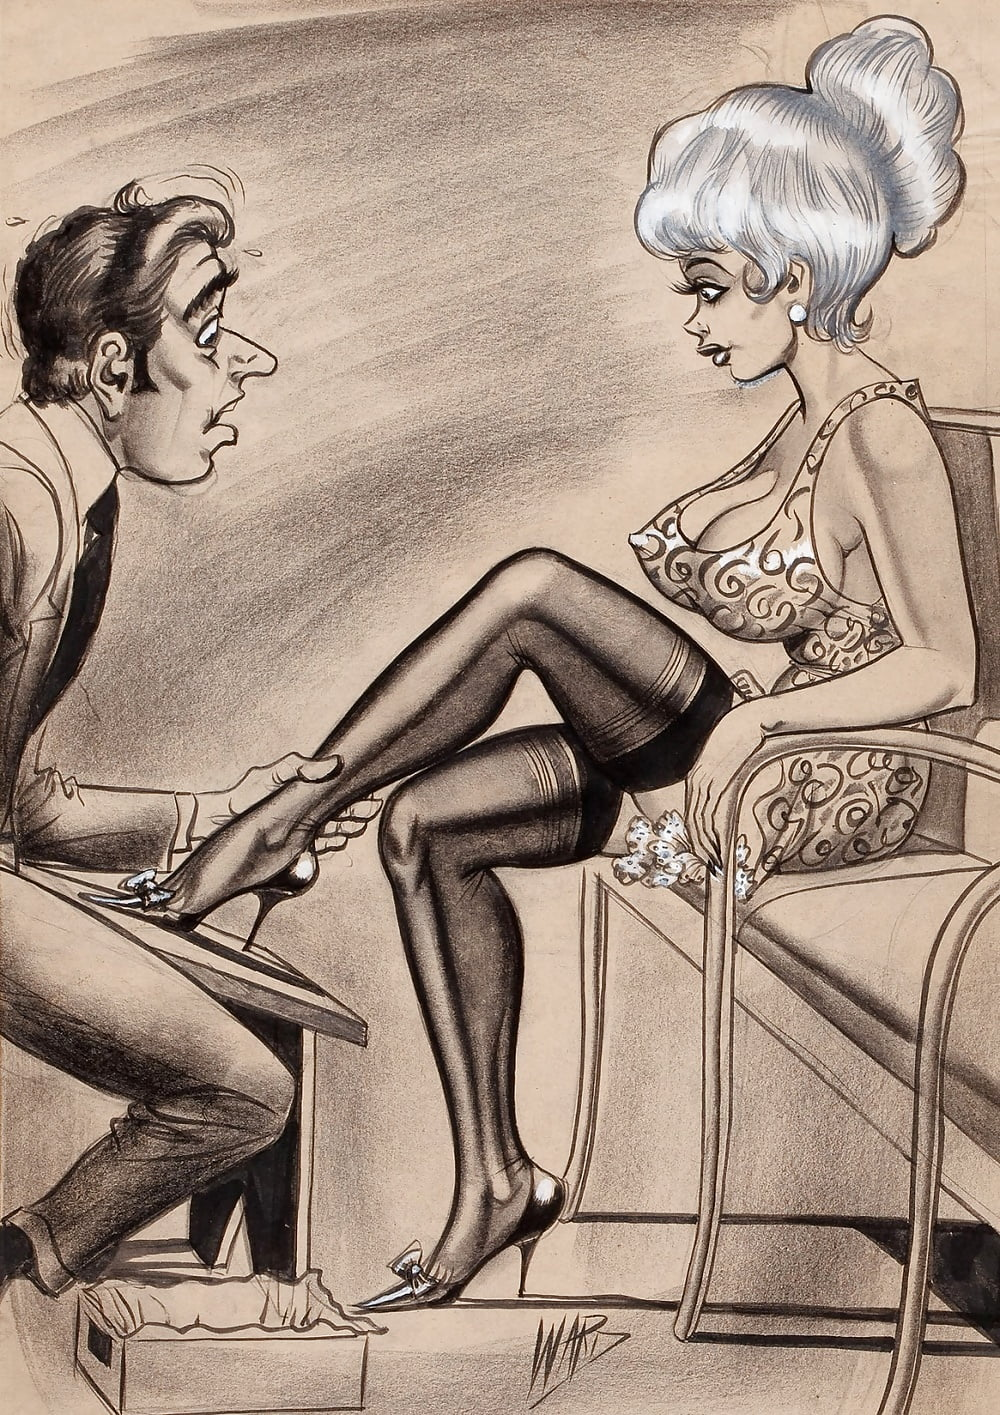 Erotic strip cartoons